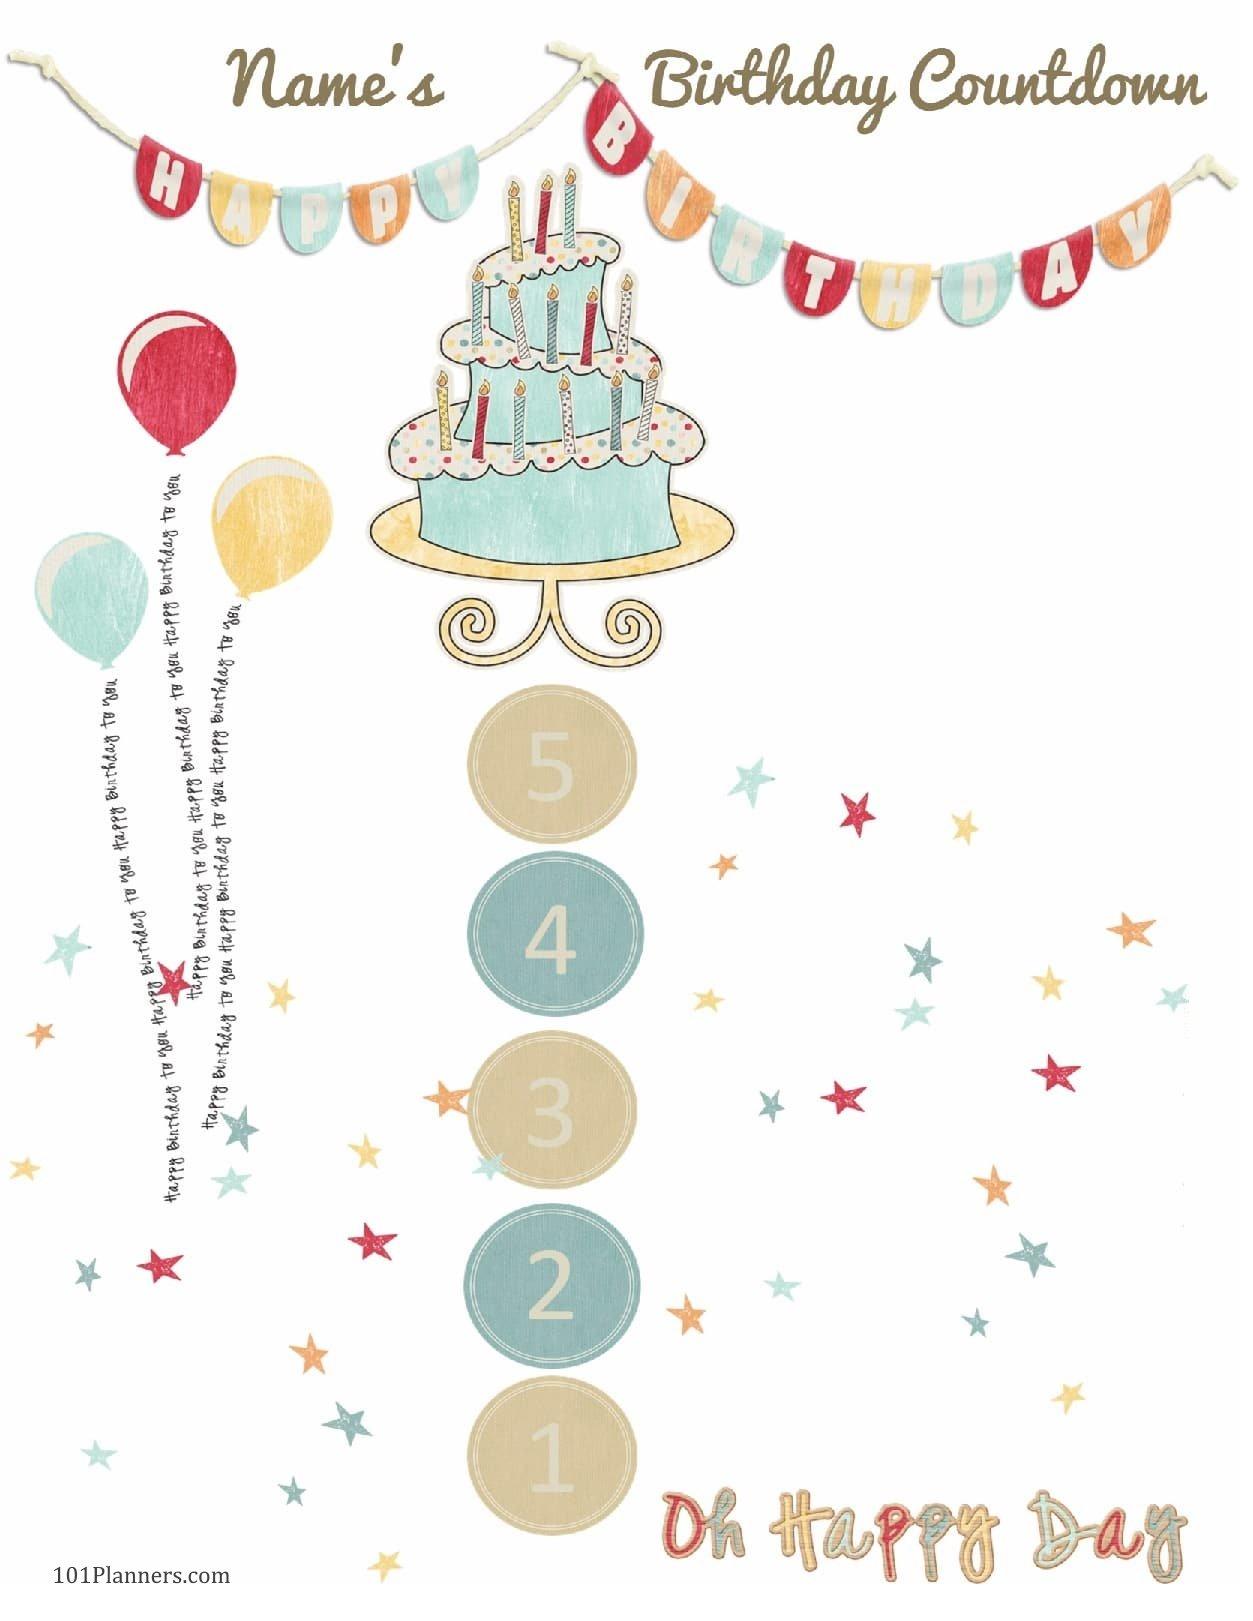 6 Colorful Birthday Countdown Calendars   Kittybabylove Pregnancy Countdown Calendar Printable Free